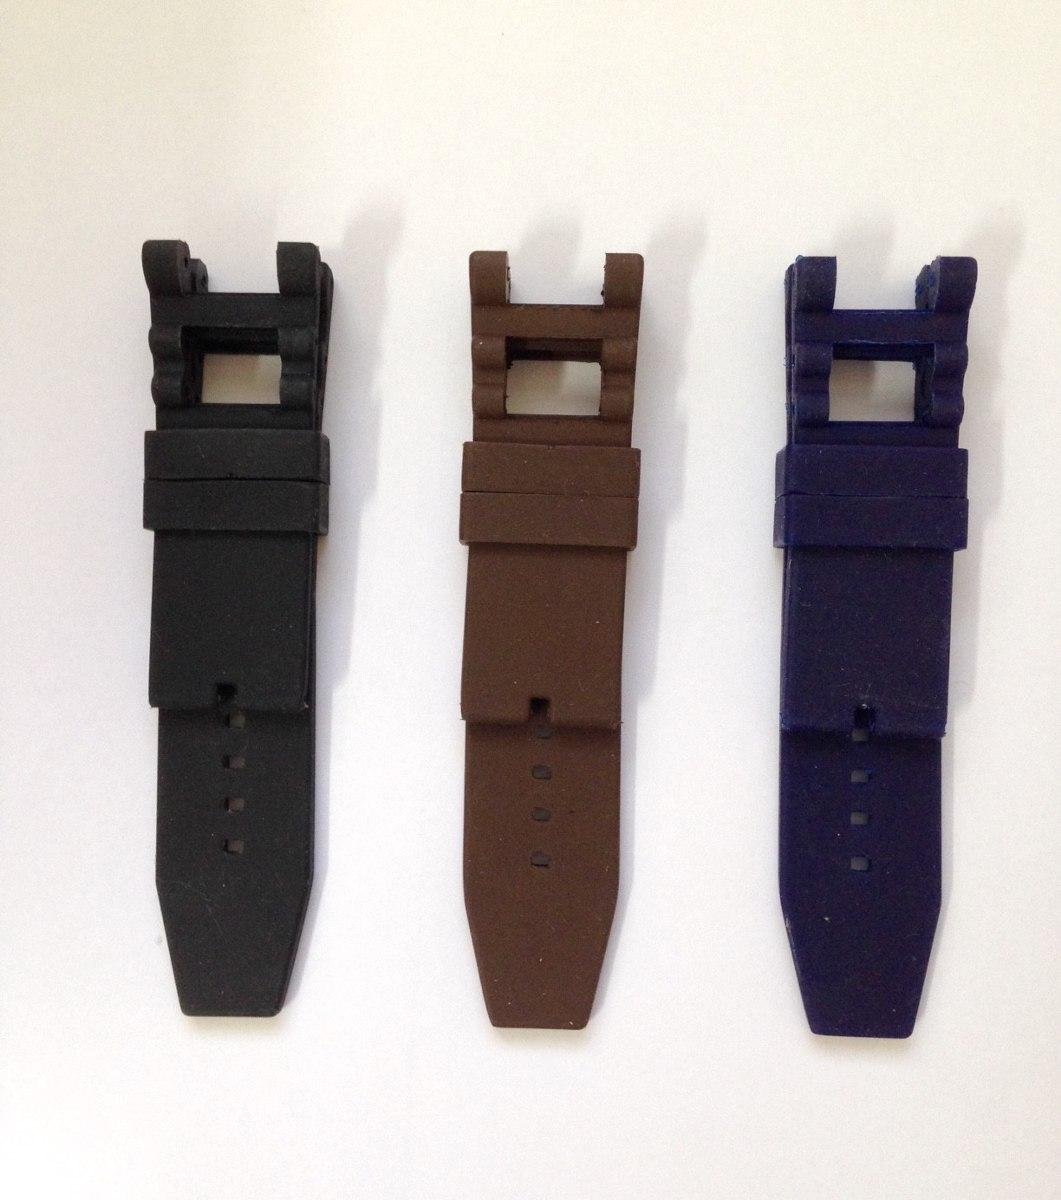 aacc74532e5 pulseira relógio invicta subaqua noma iii - nova - silicone. Carregando  zoom.